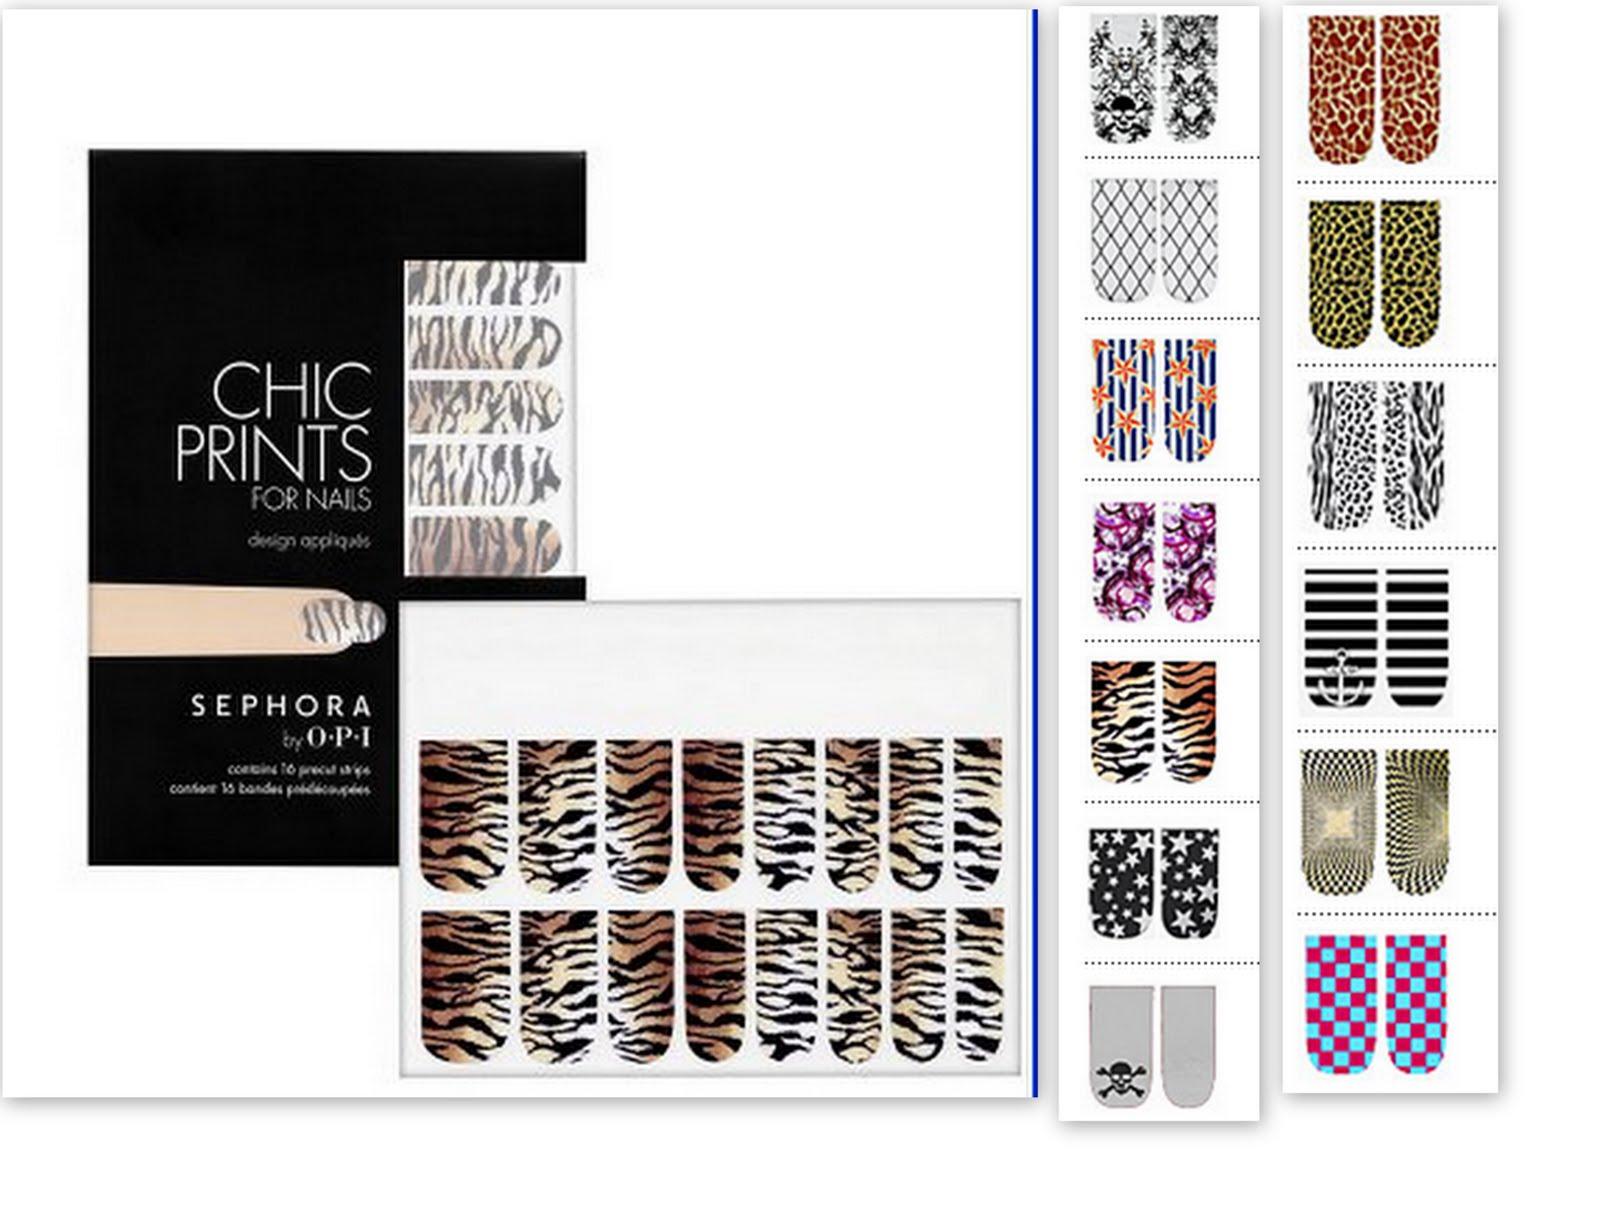 Sephora-Nail Sticker